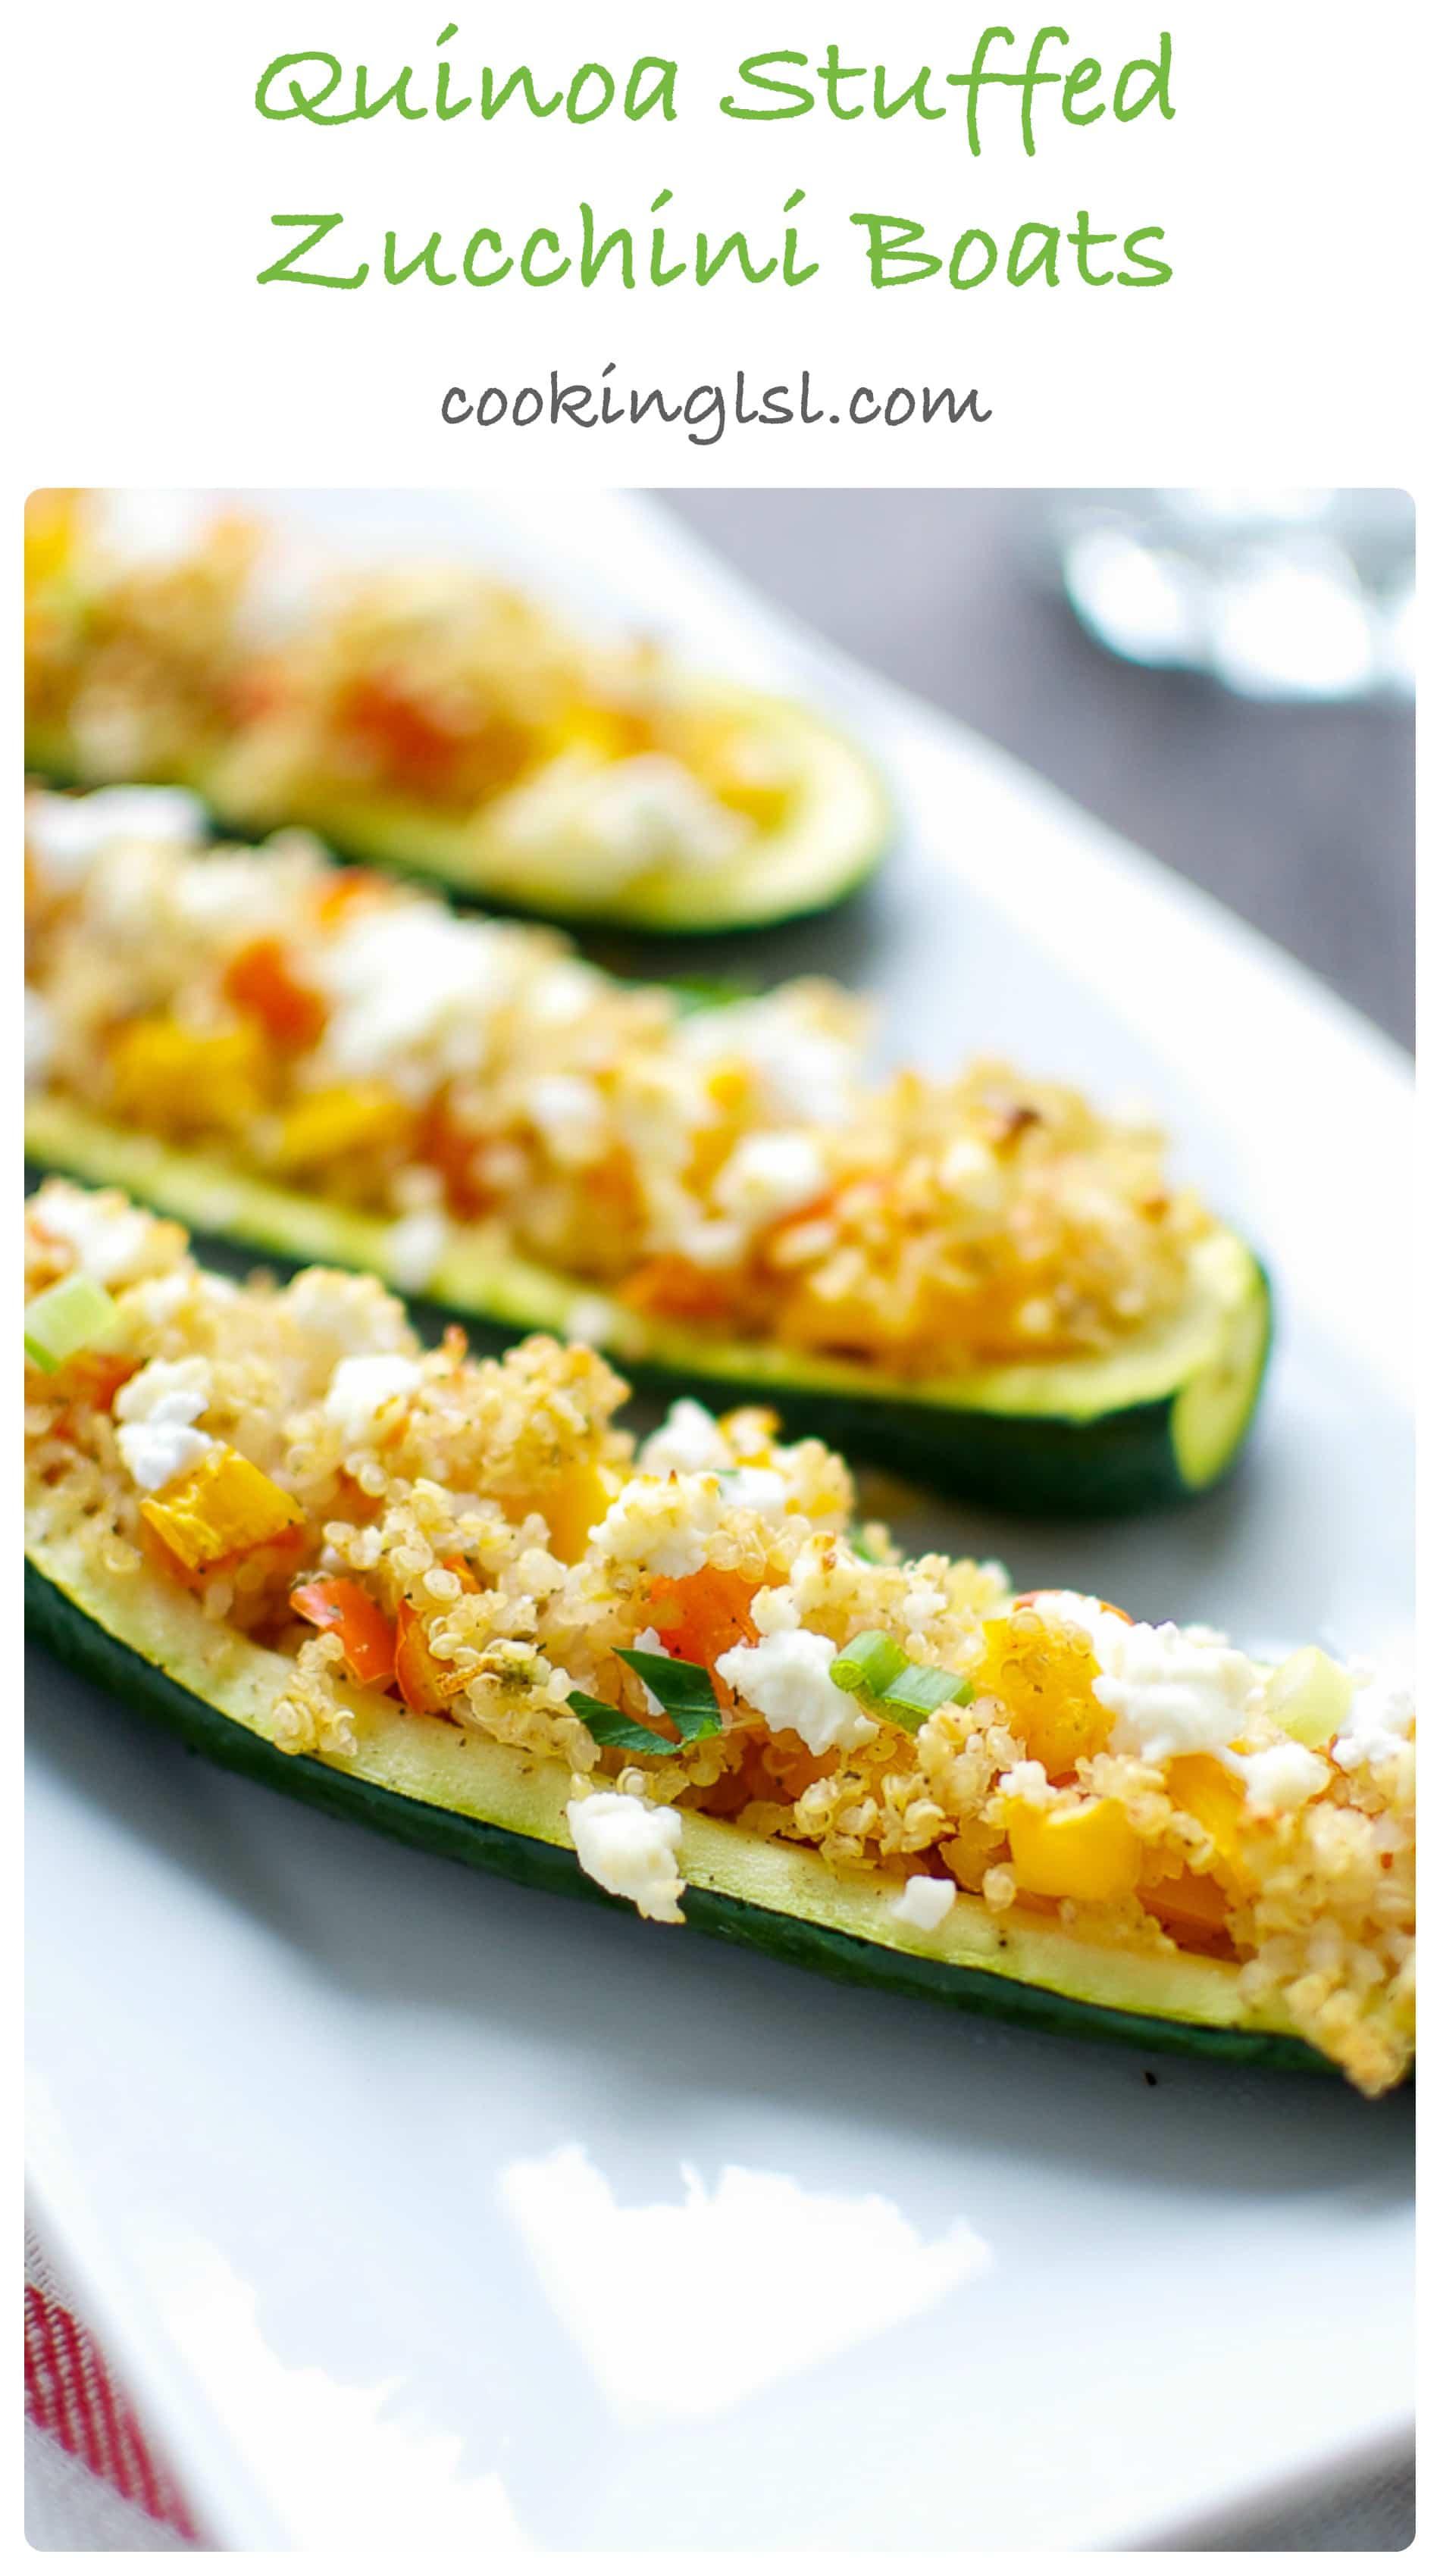 Quinoa-Stuffed-Zucchini-Boats